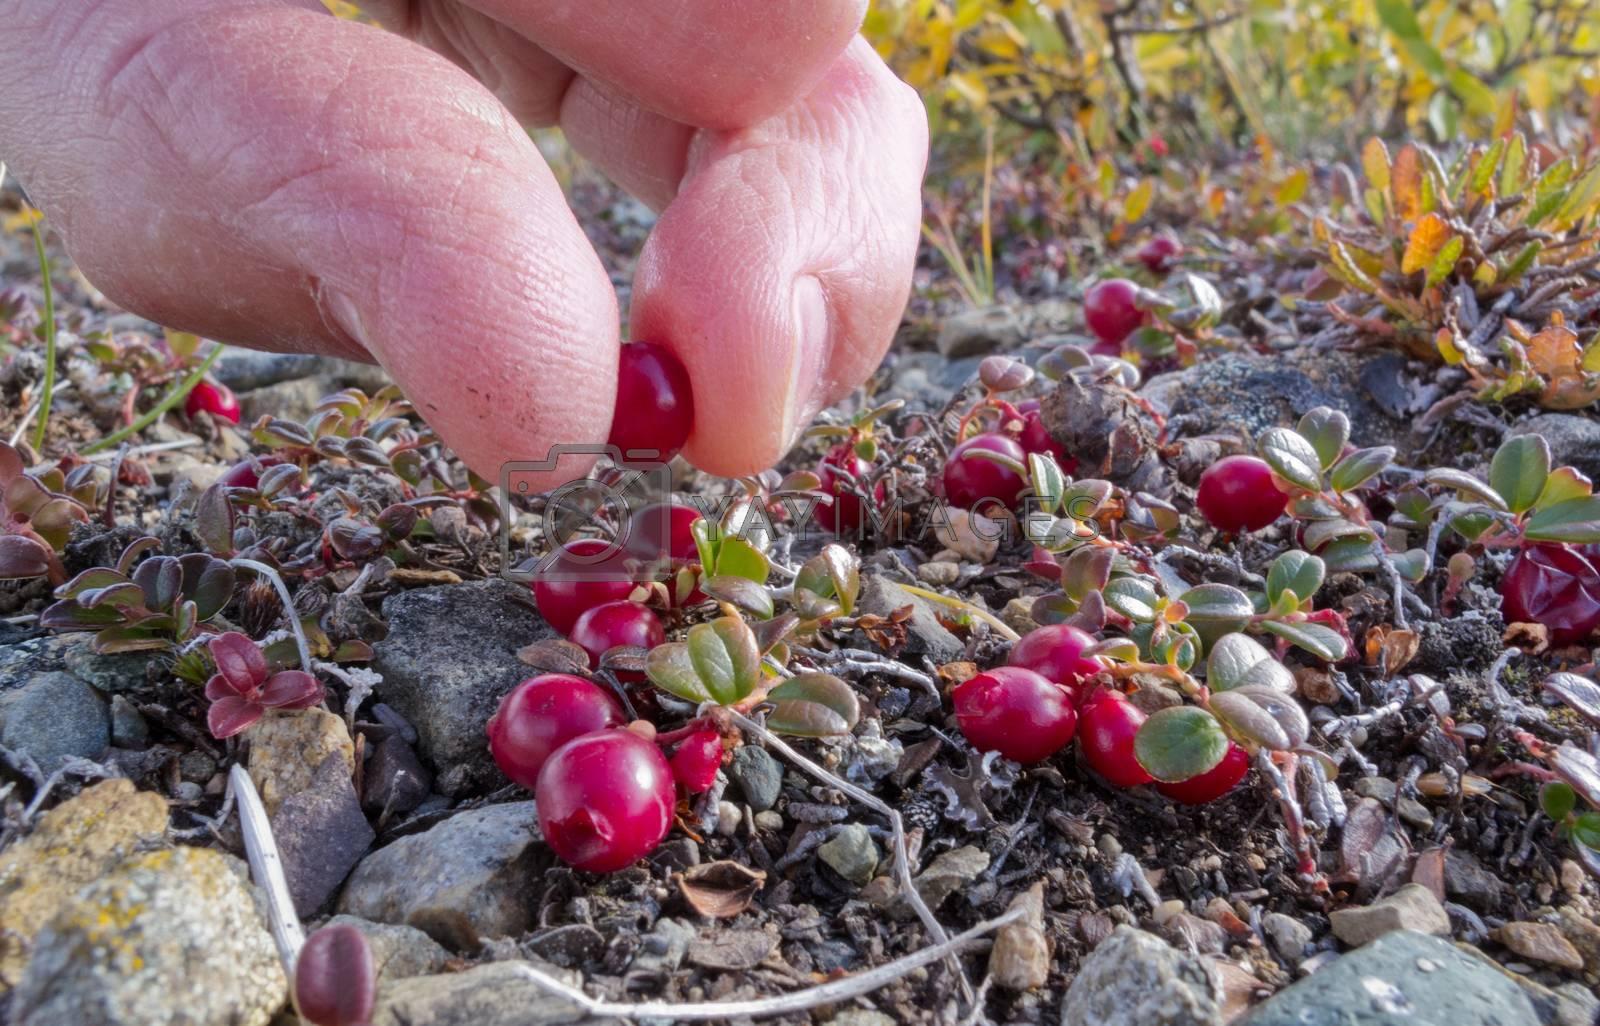 Cranberry Vaccinium vitis-idaea pick alpine tundra by PiLens